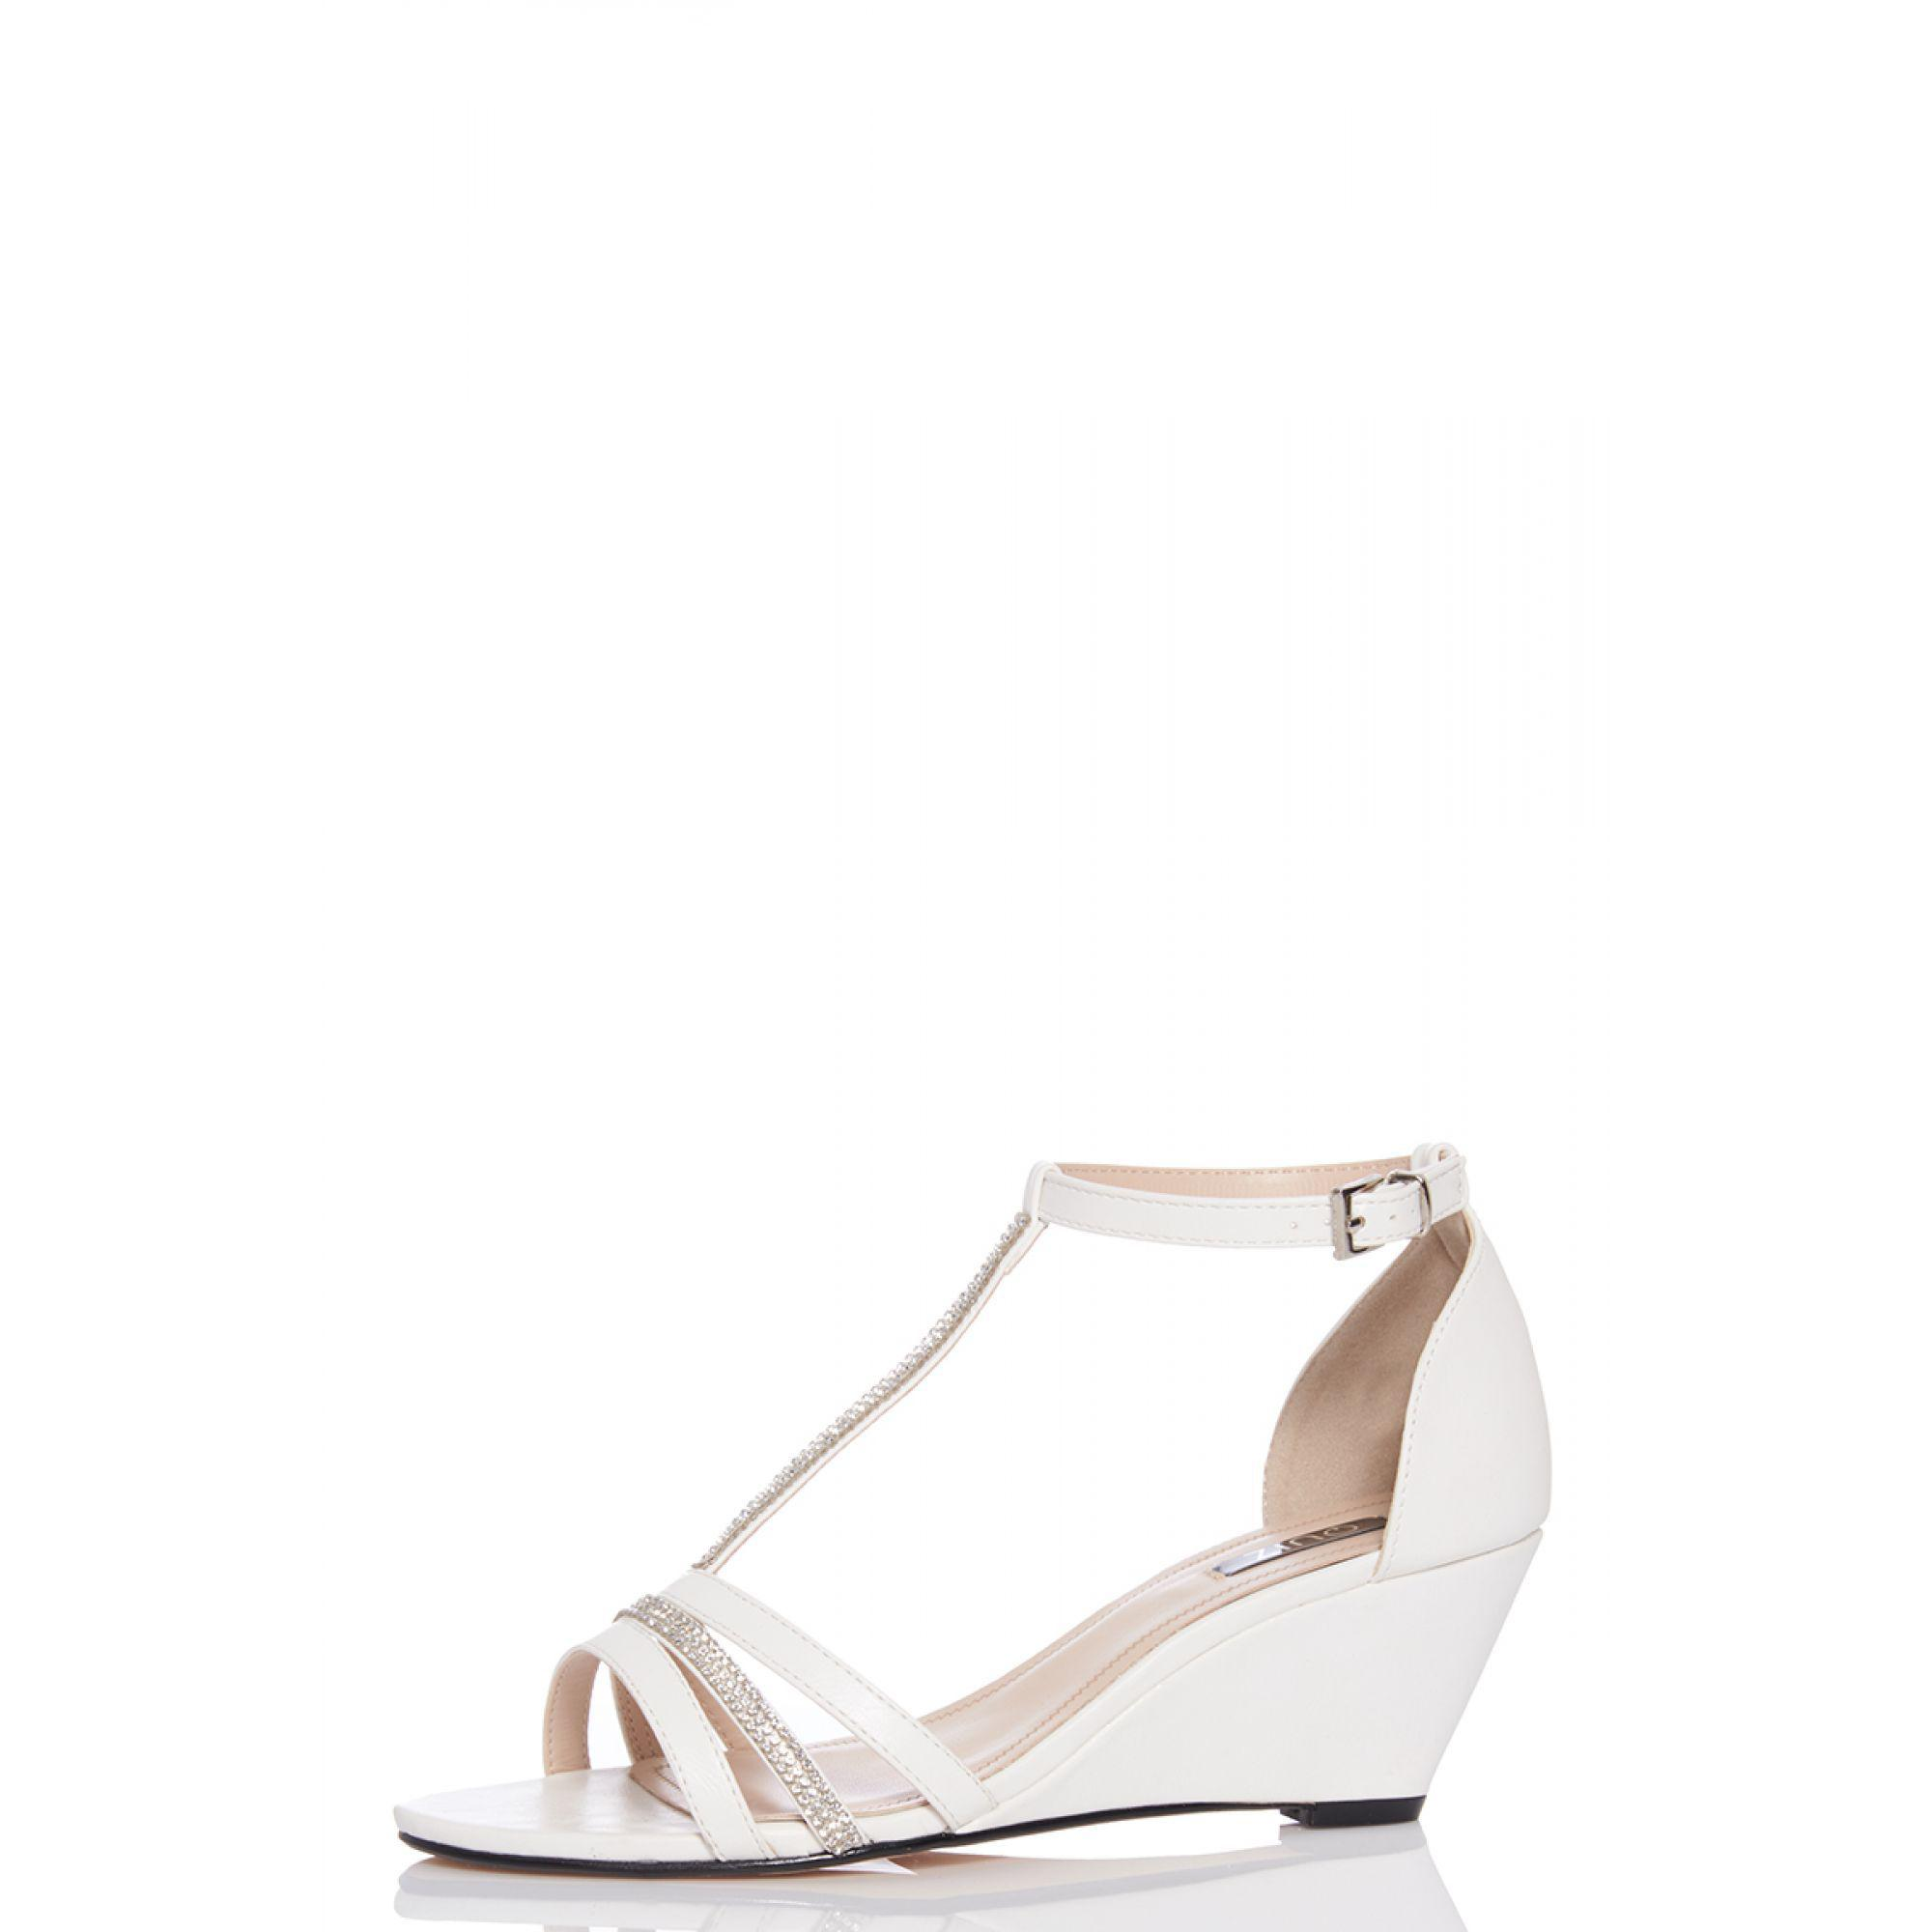 Quiz White Diamante Strap Low Heel Wedge in White - Lyst 4748b8d1e0ff